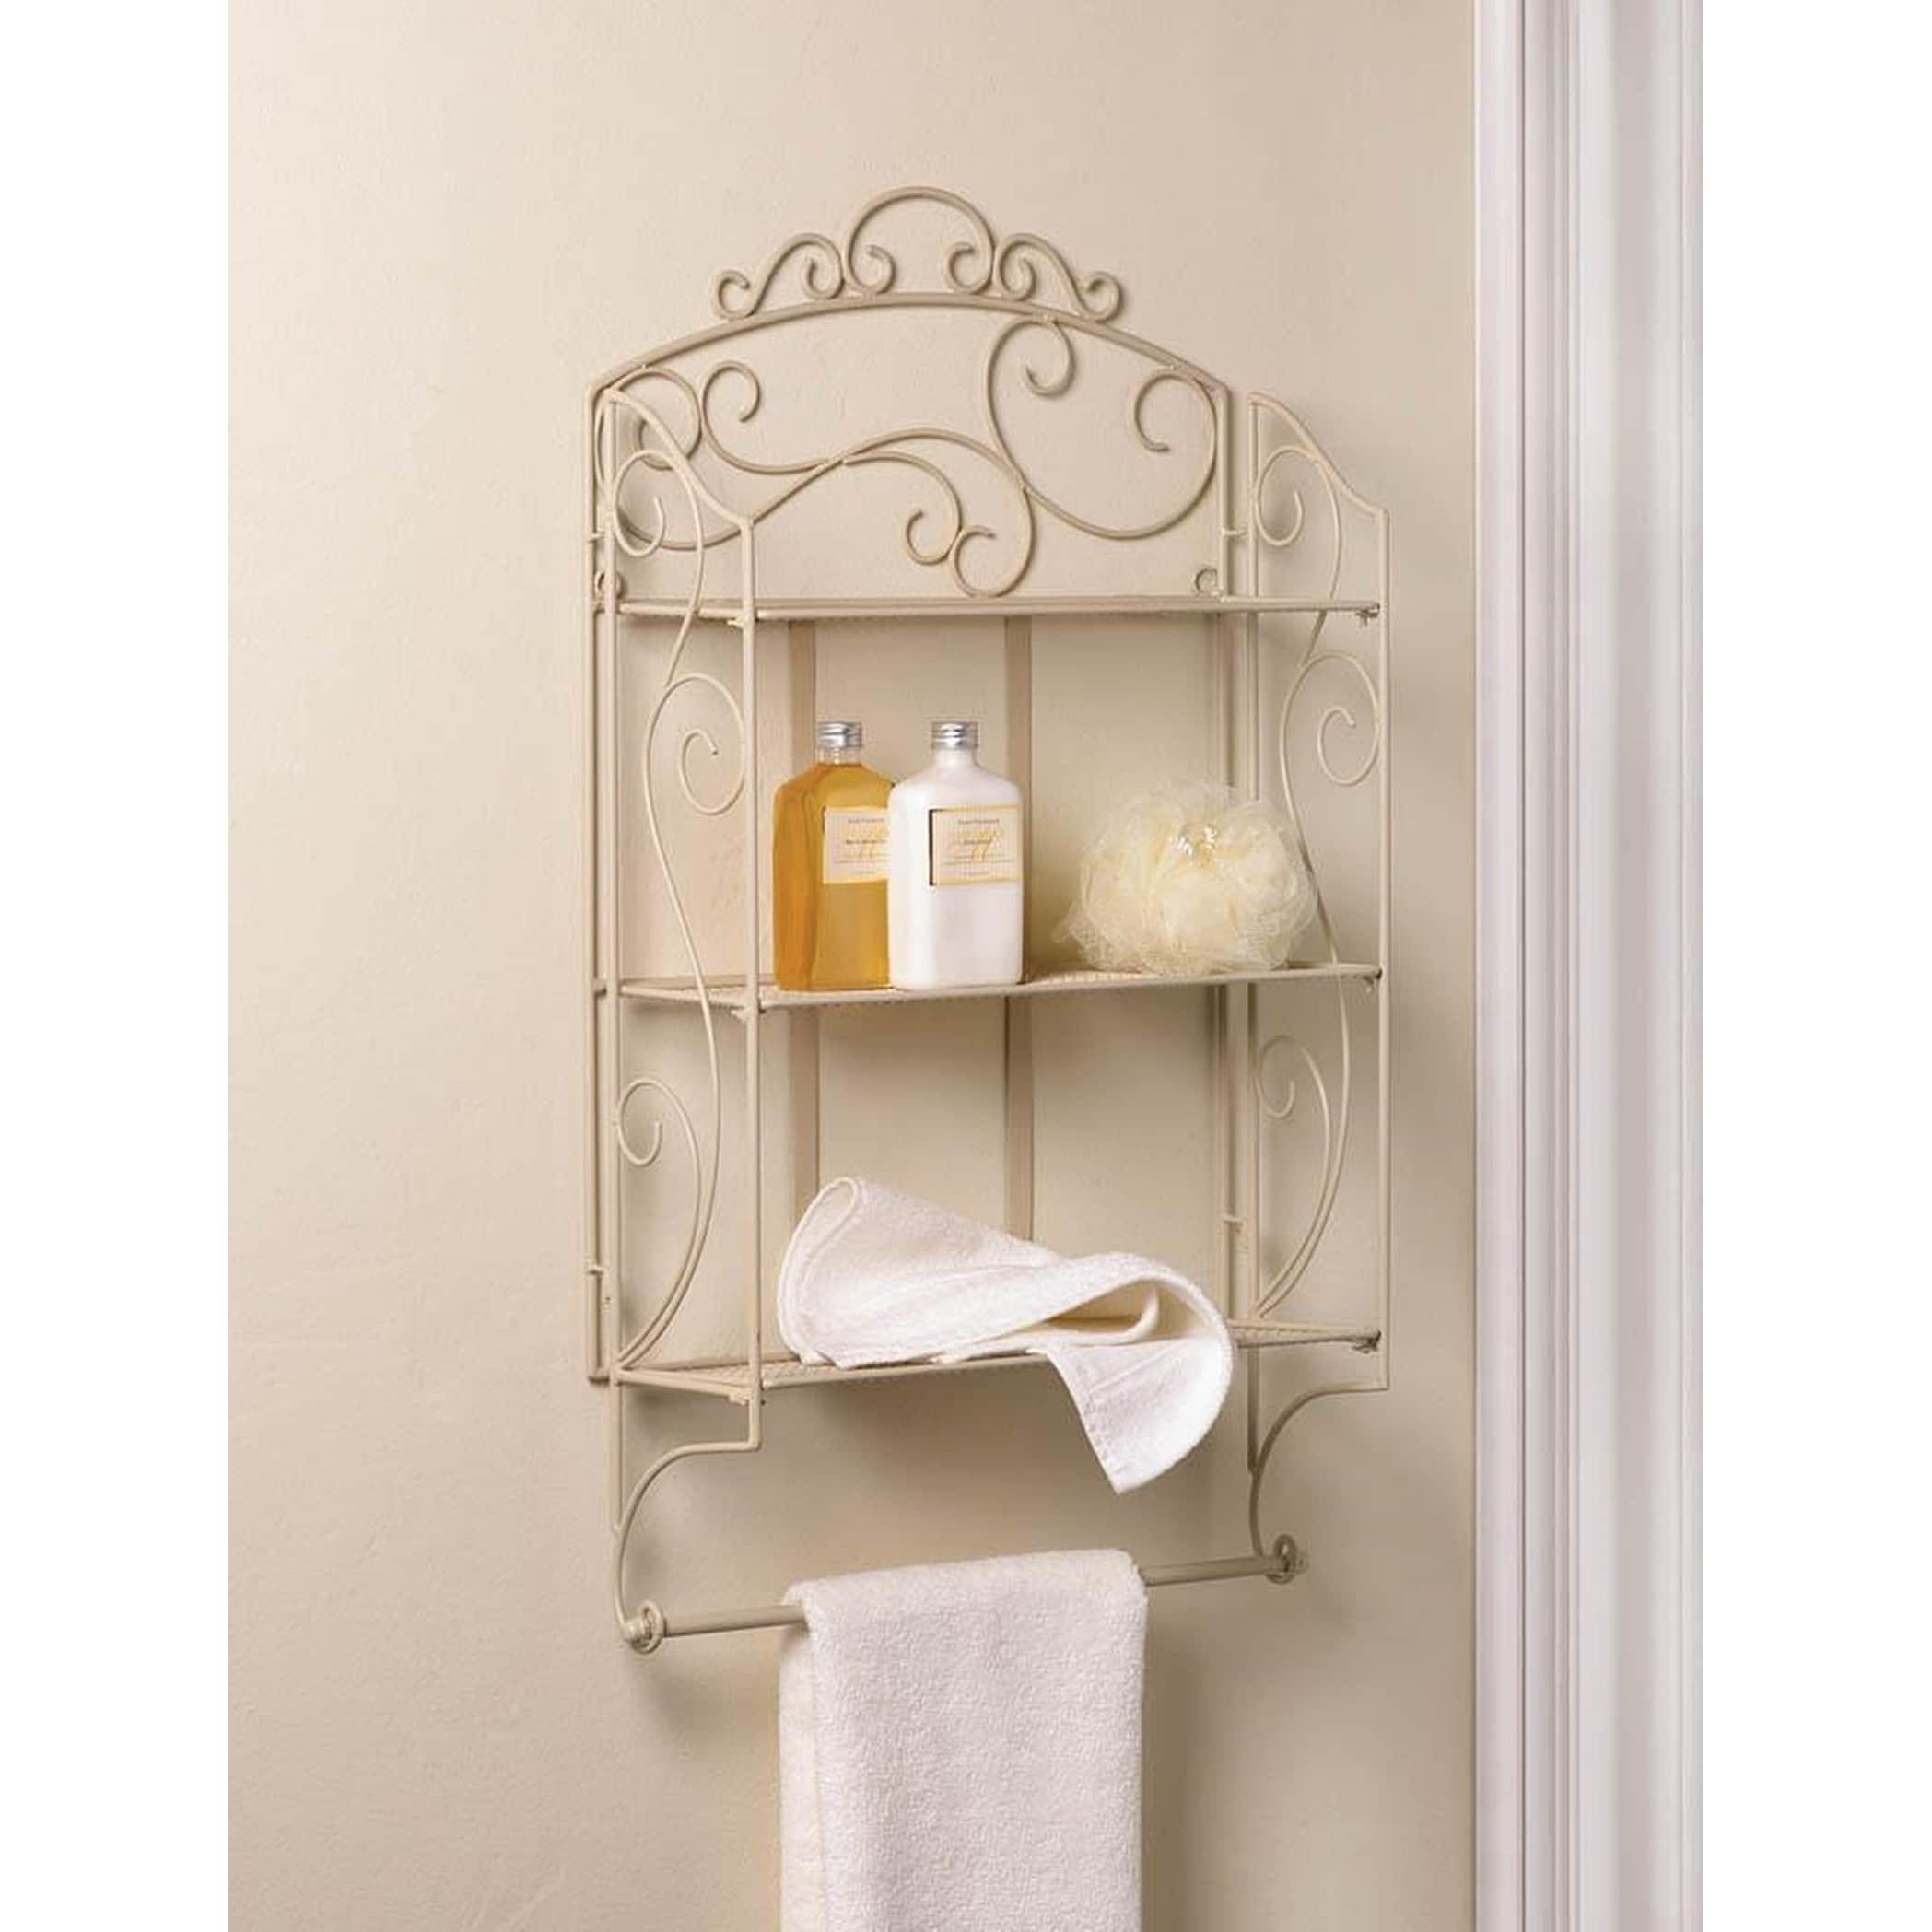 Shop Stella Flourishing 3-Shelves Wall Decor with Towel Bar - Beige ...